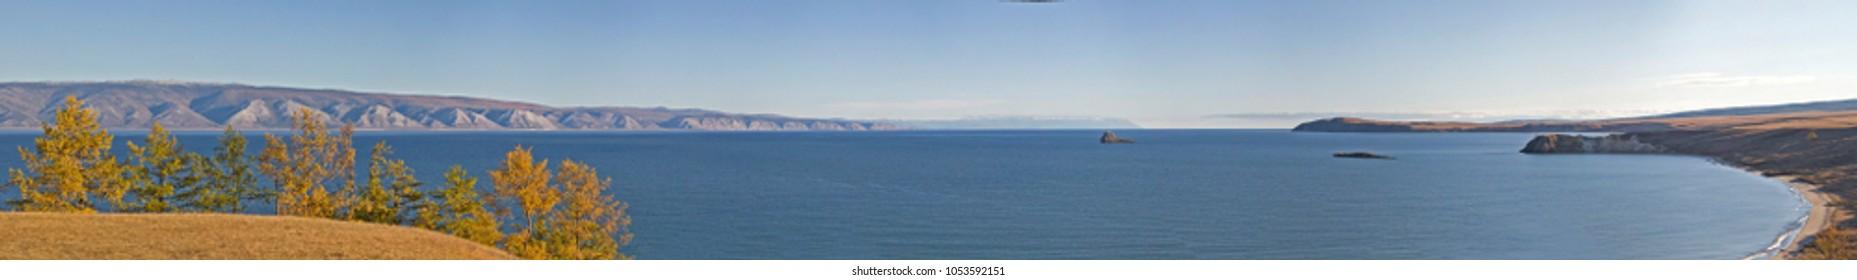 Olkhon Island in Lake Baikal, Siberia, Russia. Panorama.